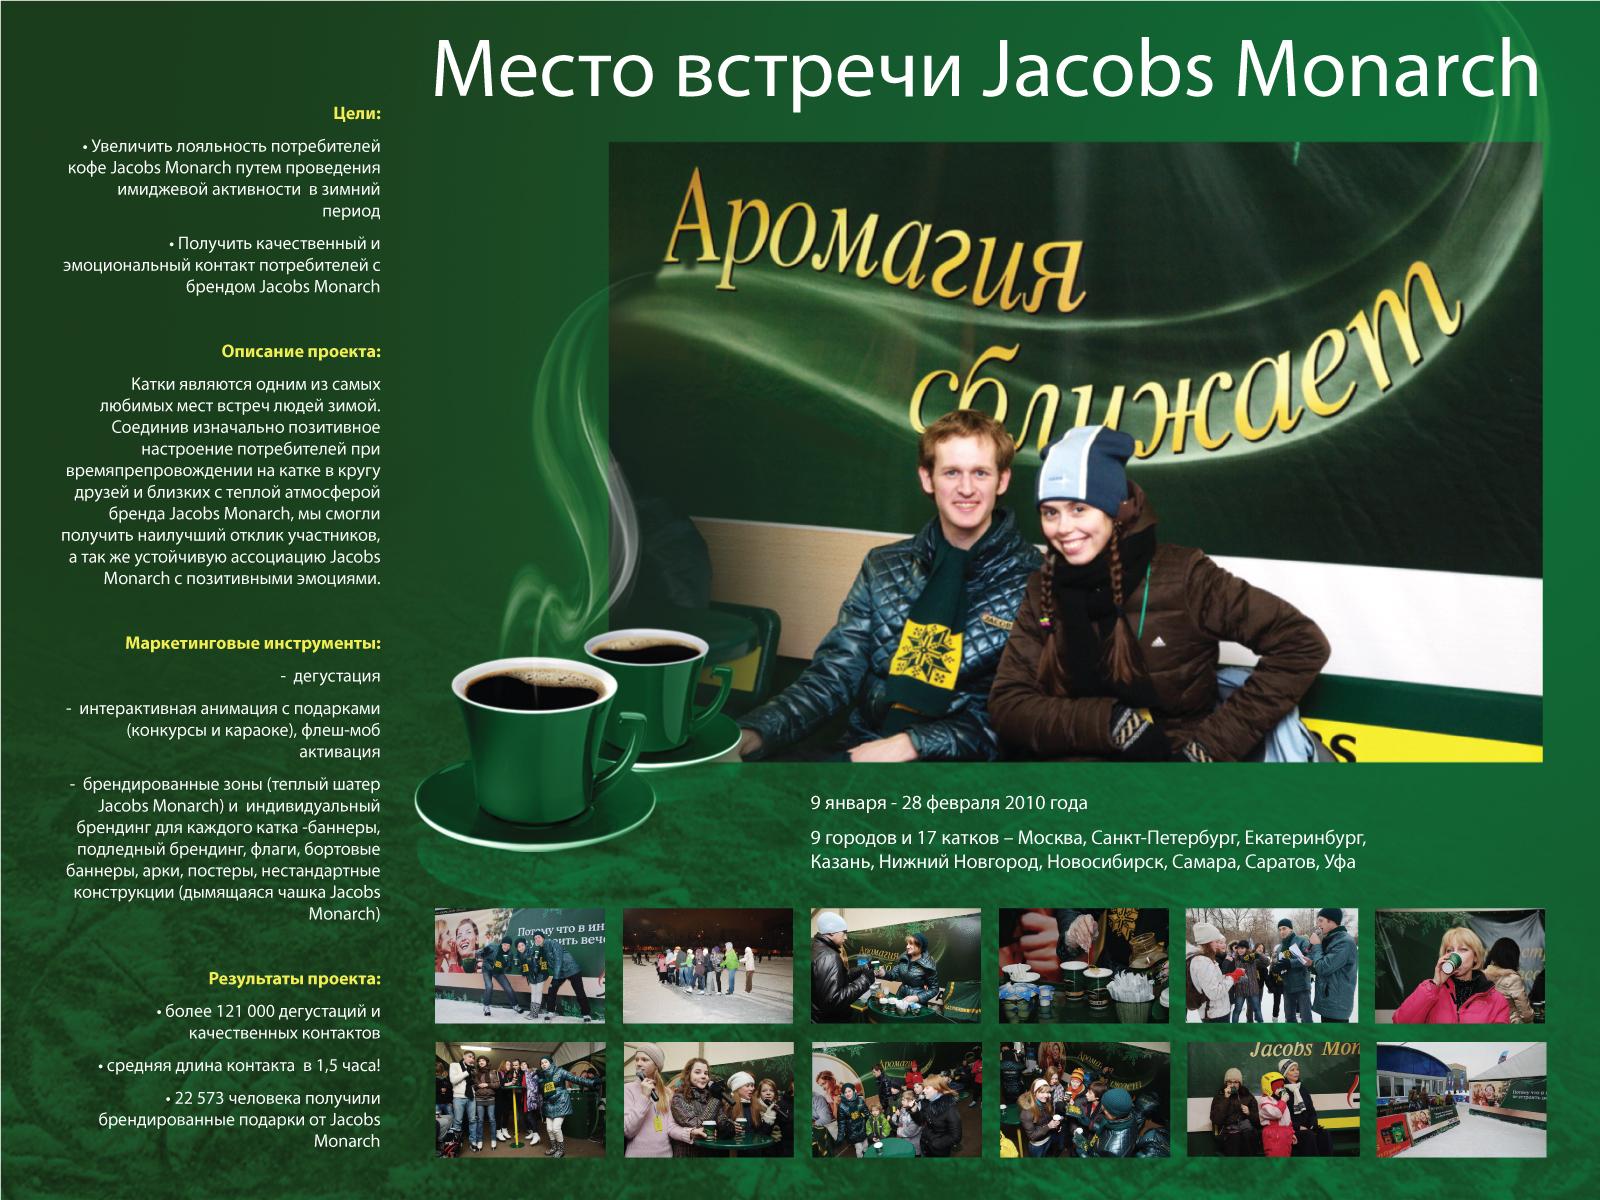 Реклама якобс монарх 11 фотография